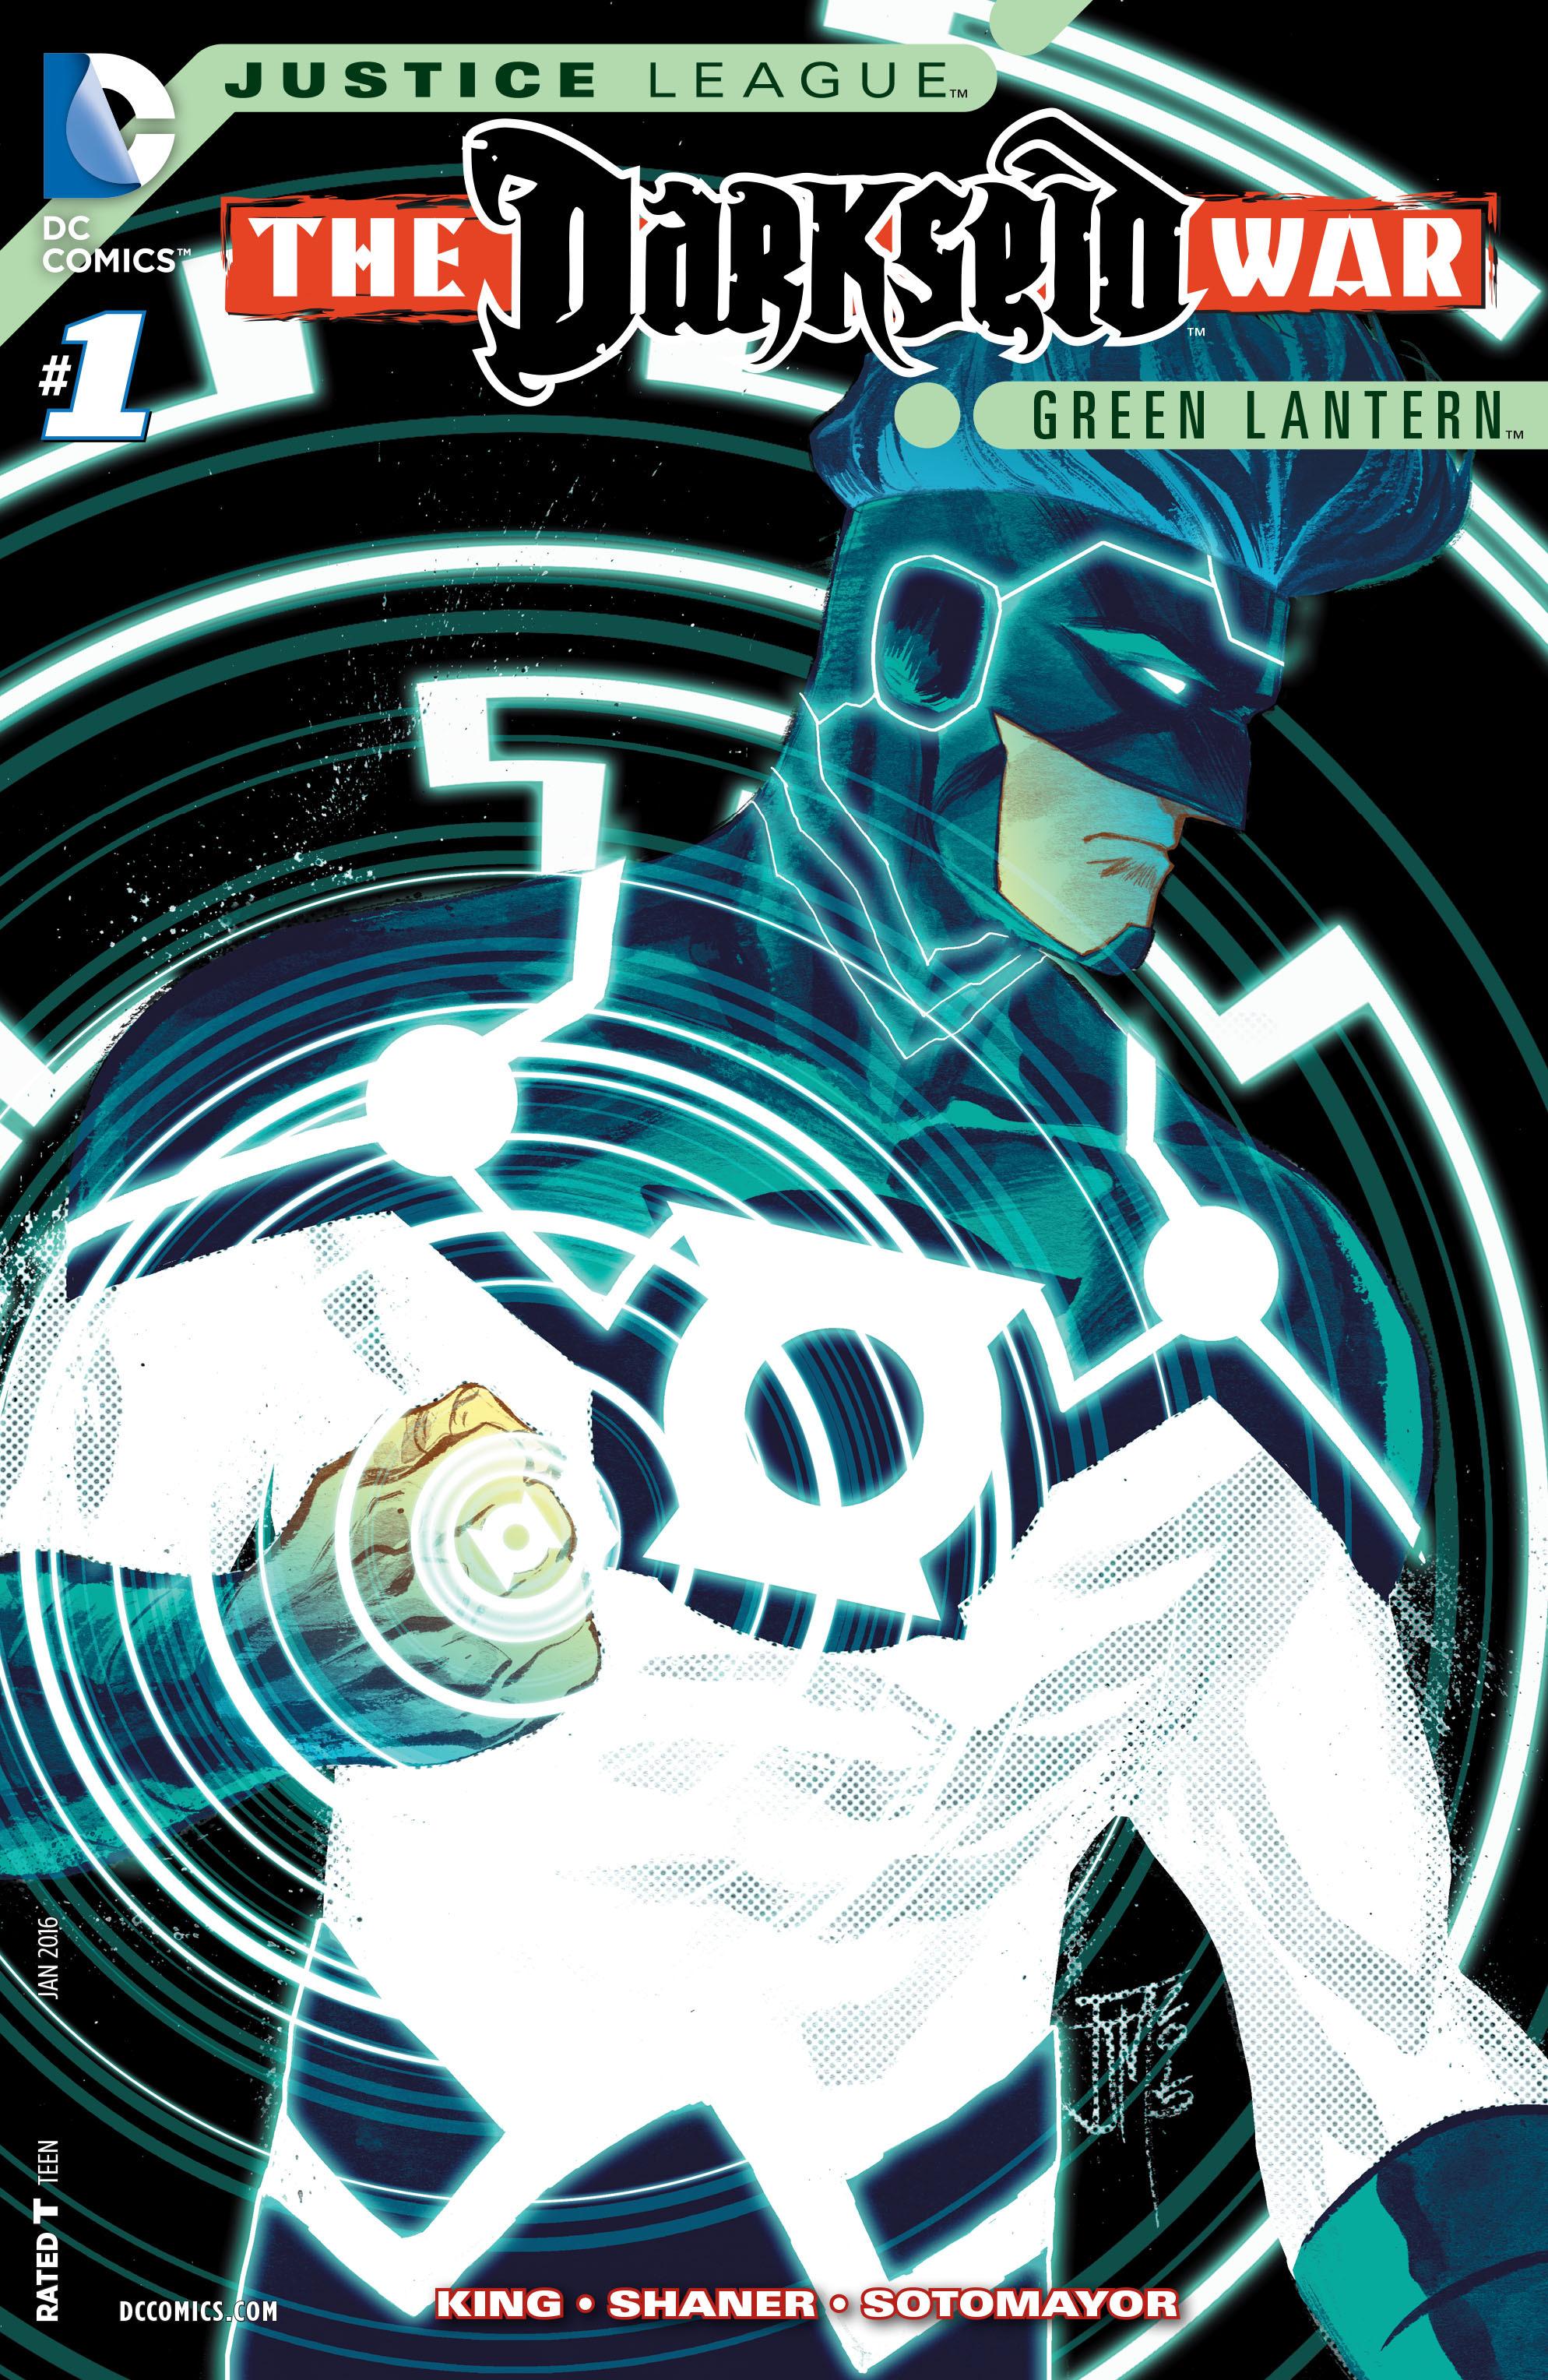 Justice League: Darkseid War: Green Lantern 1 Page 1